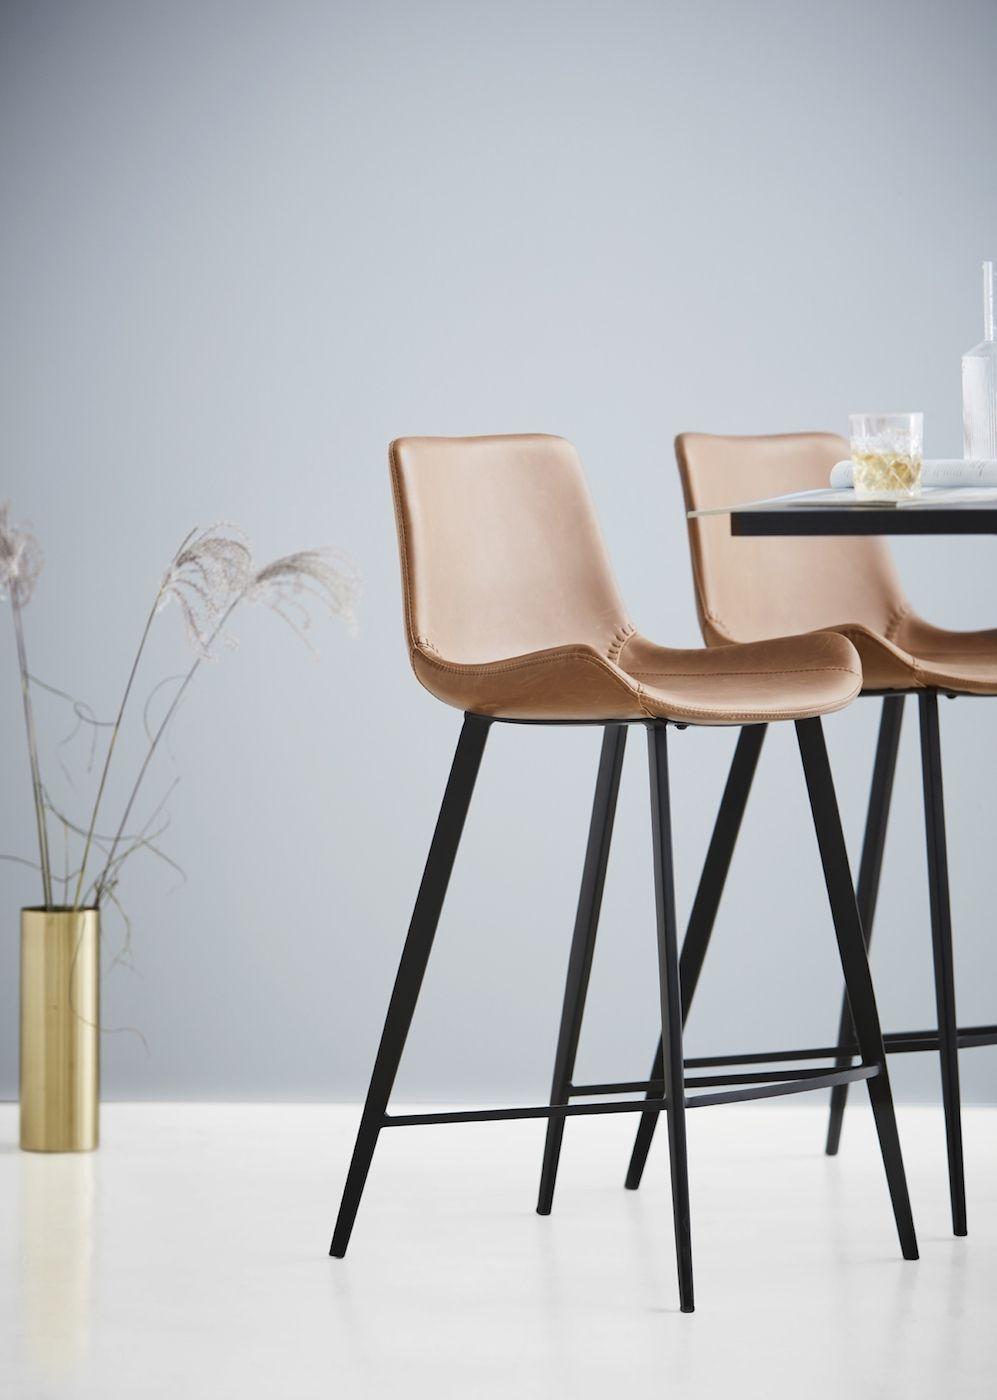 Danform - Hype Barstol - Brun kunstlæder - Barstol i brun